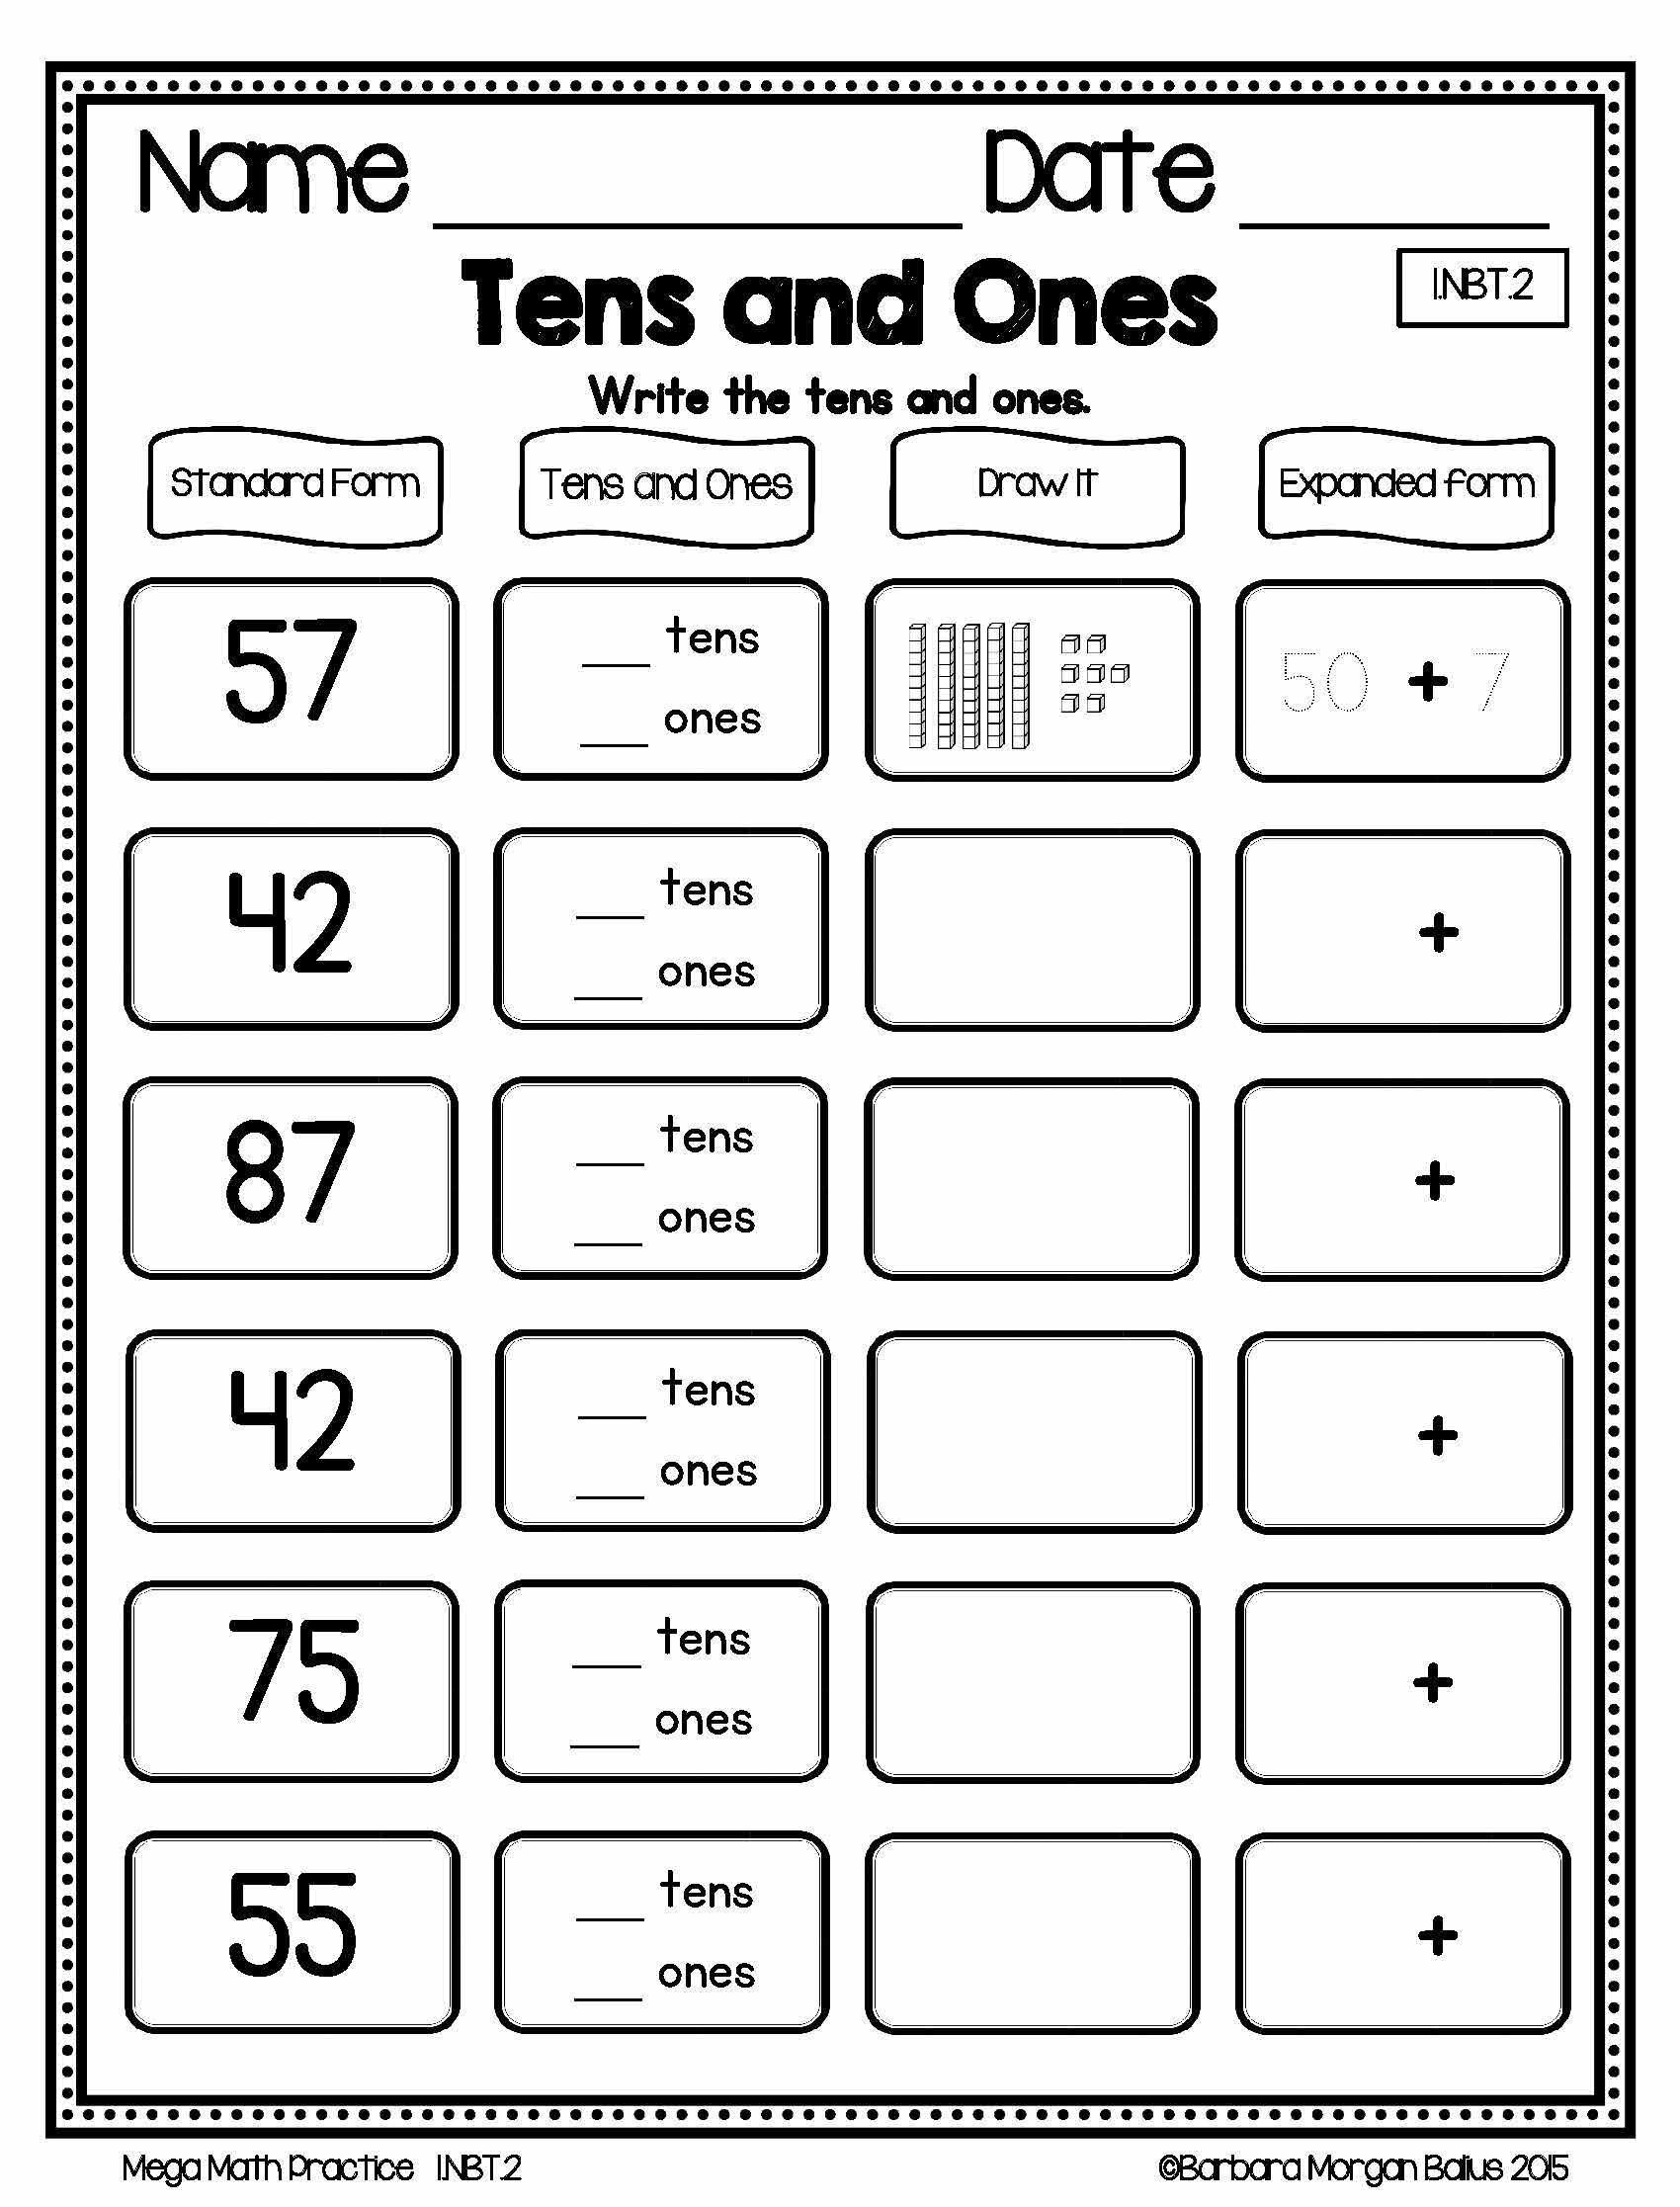 hight resolution of Expanded form Worksheets 2nd Grade Mega Math Practice Nbt Freebie Preview  Ccss 1 Nbt in 2020   Mega math